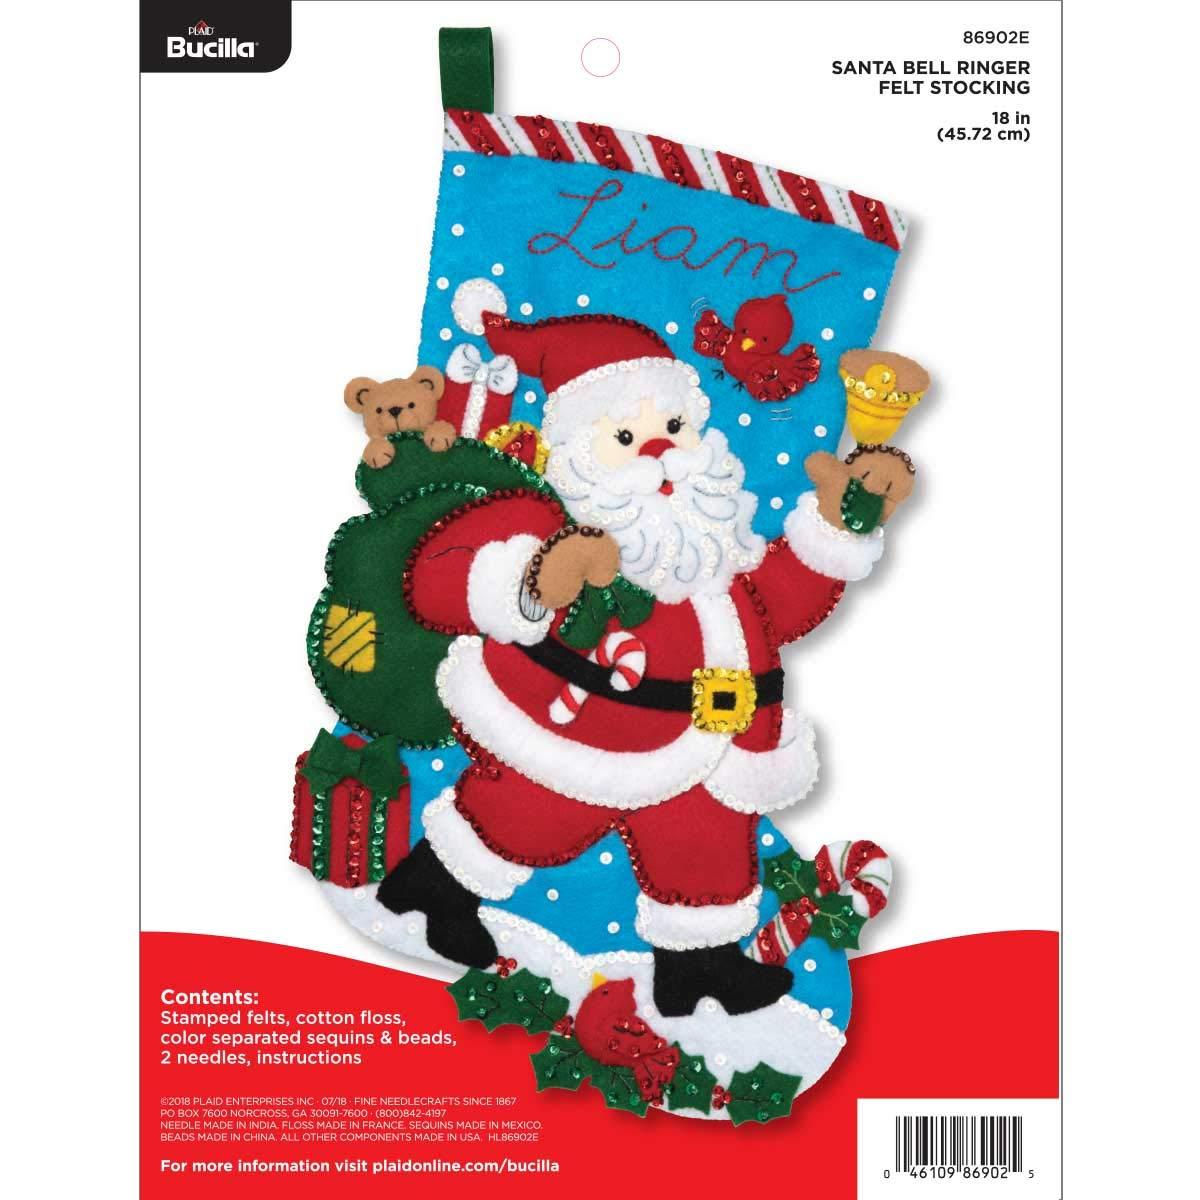 "Bucilla Felt Applique Christmas Stocking Kit, 18"", Santa Bell Ringer"